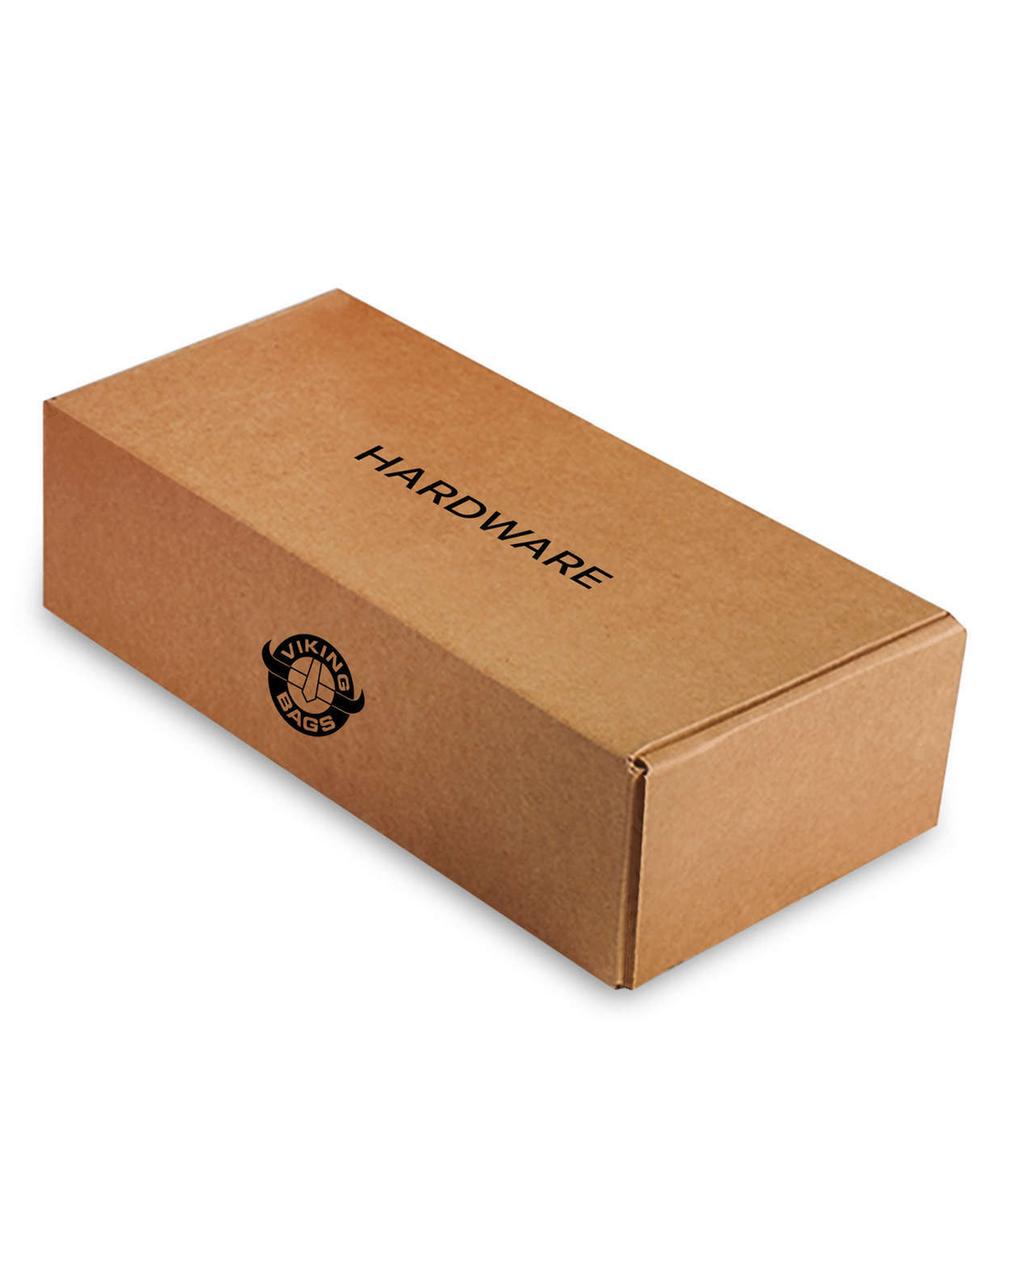 Viking Lamellar Large Leather Covered Non-Shock Cutout Hard Saddlebags For Harley Softail Custom FXSTC Hardware Box